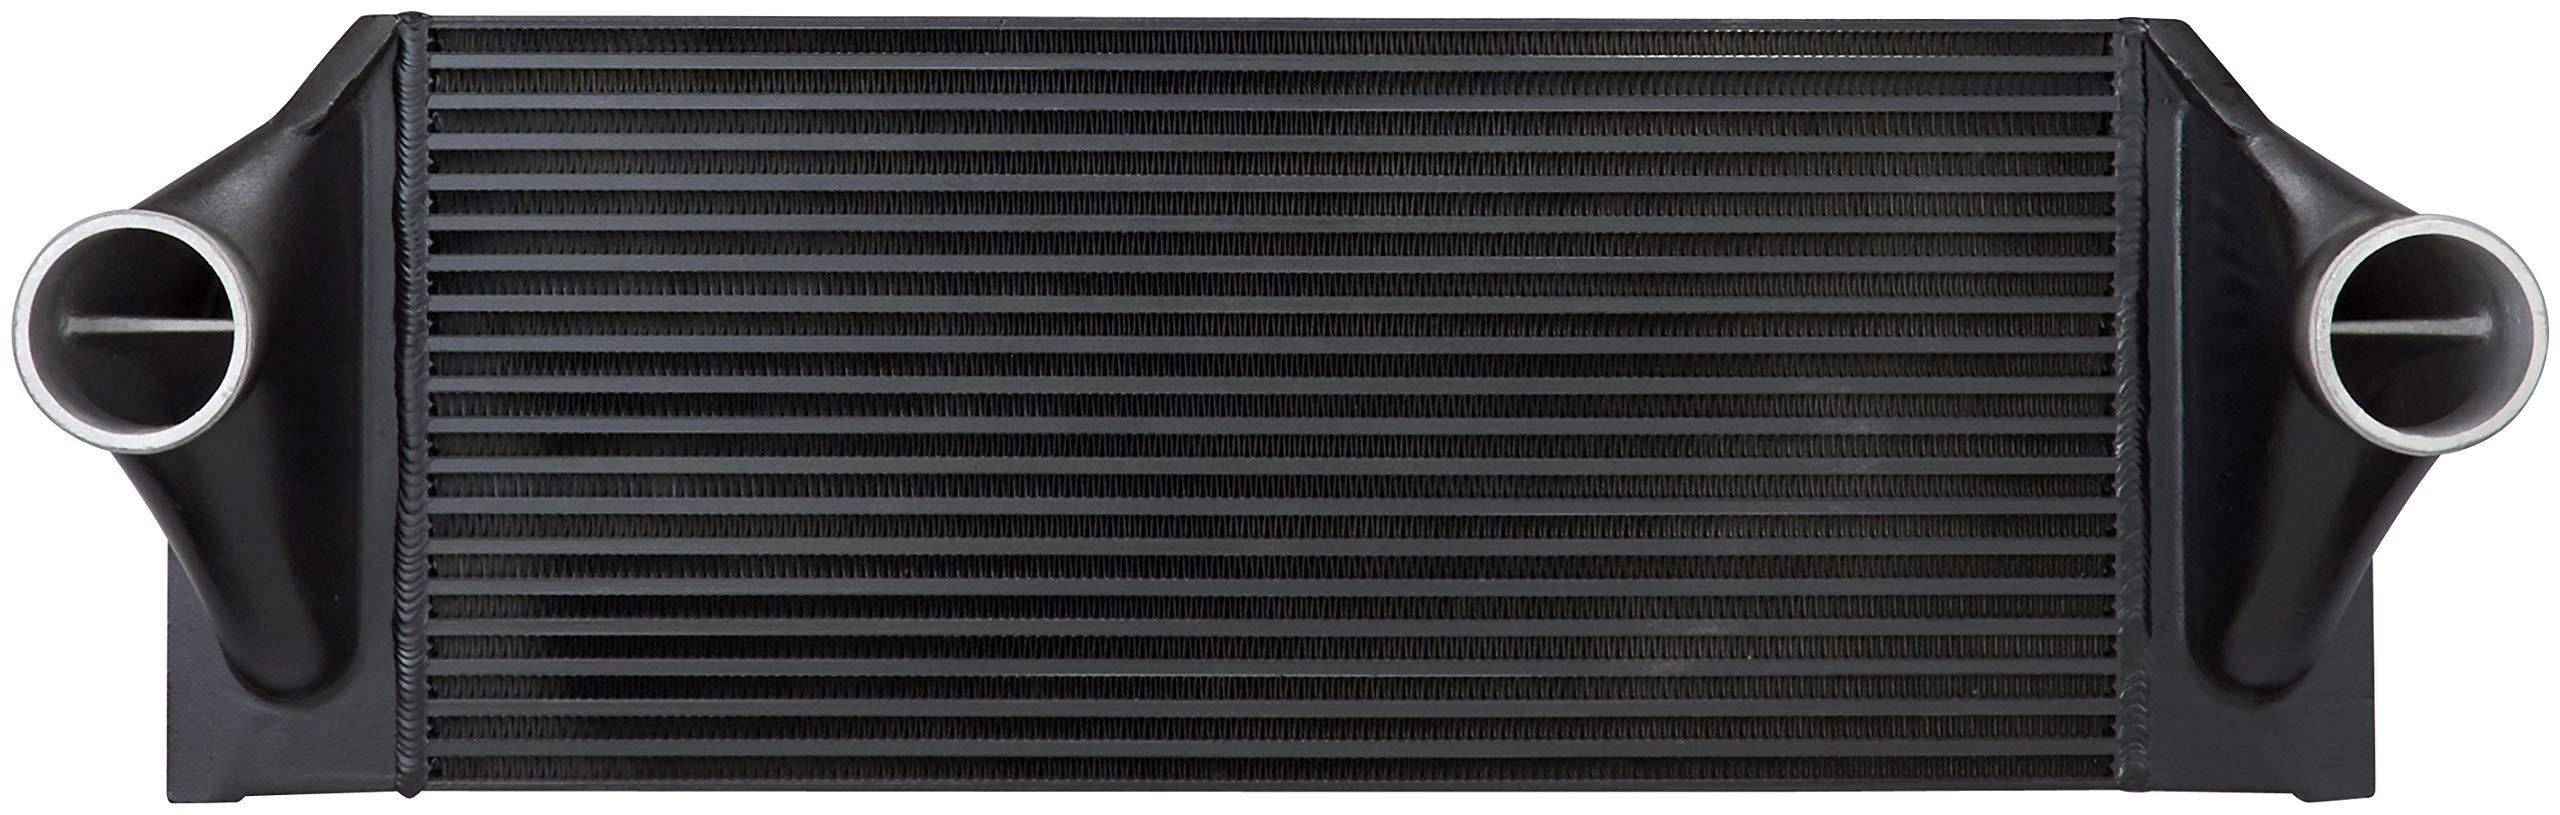 Spectra Premium 4401-3813 Turbocharger Intercooler by Spectra Premium